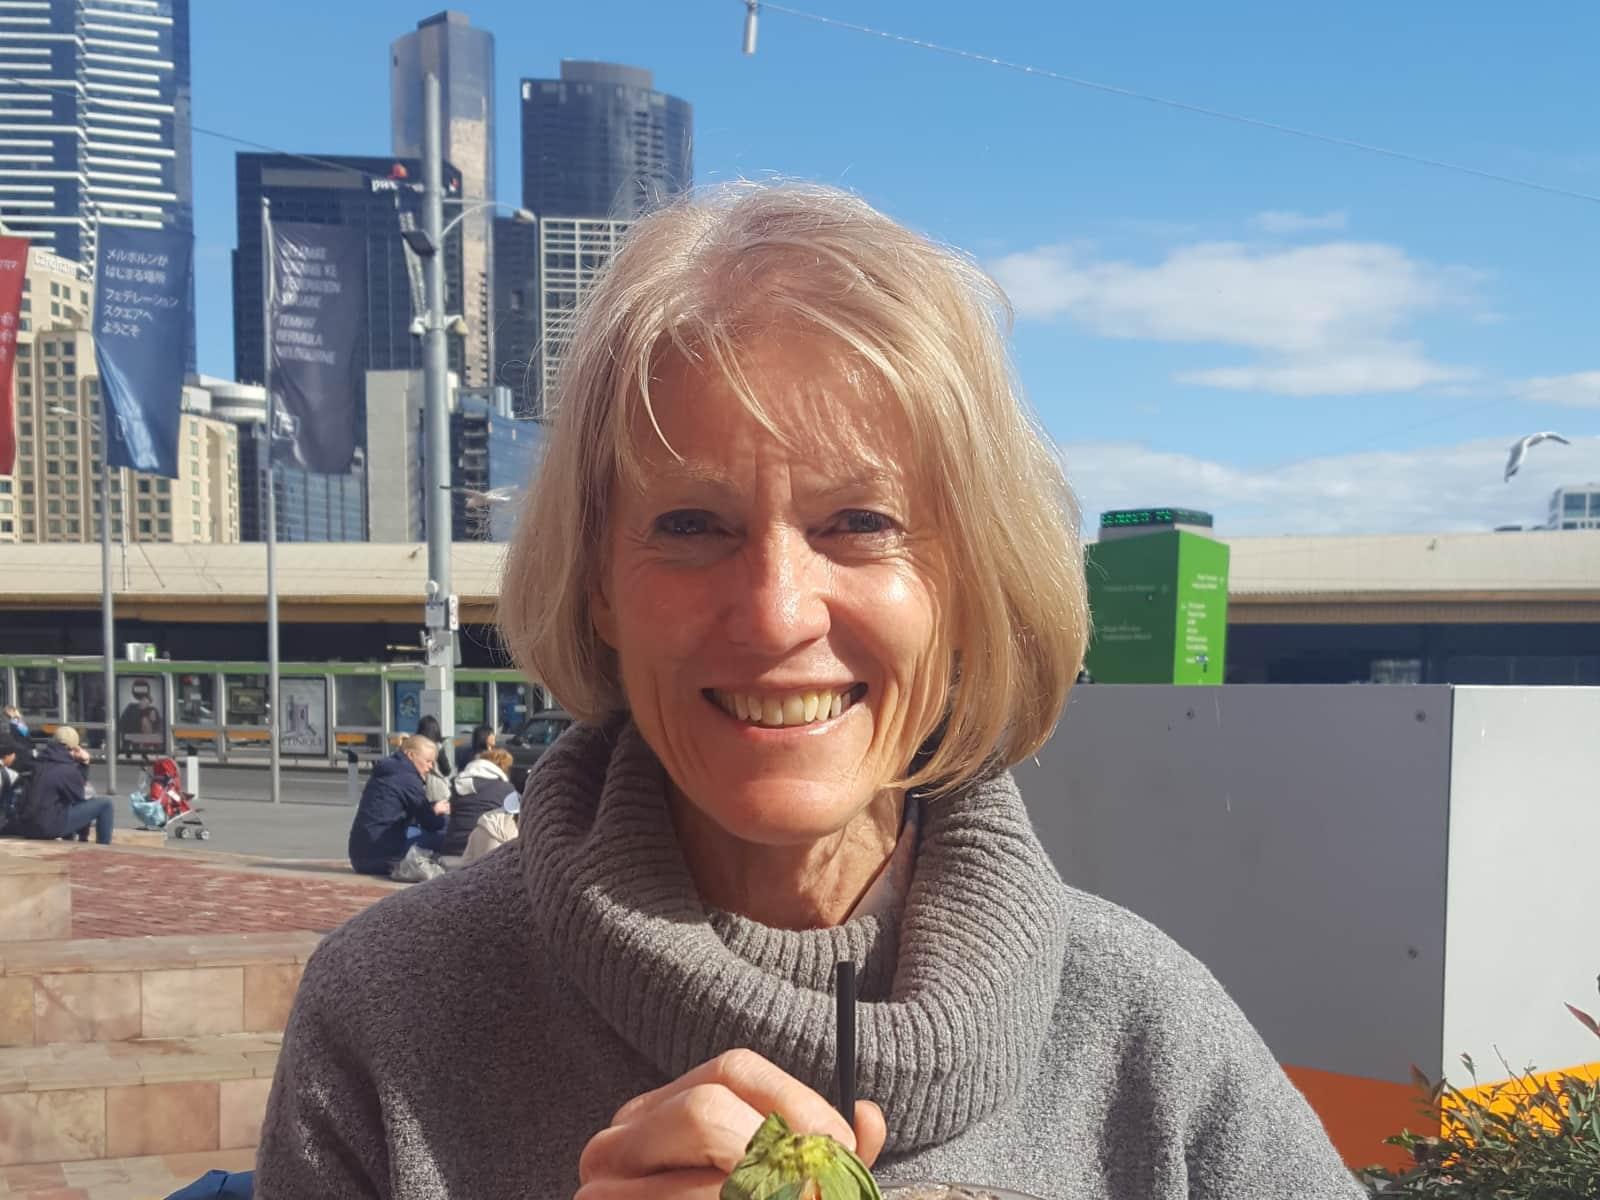 Liz from Melbourne, Victoria, Australia